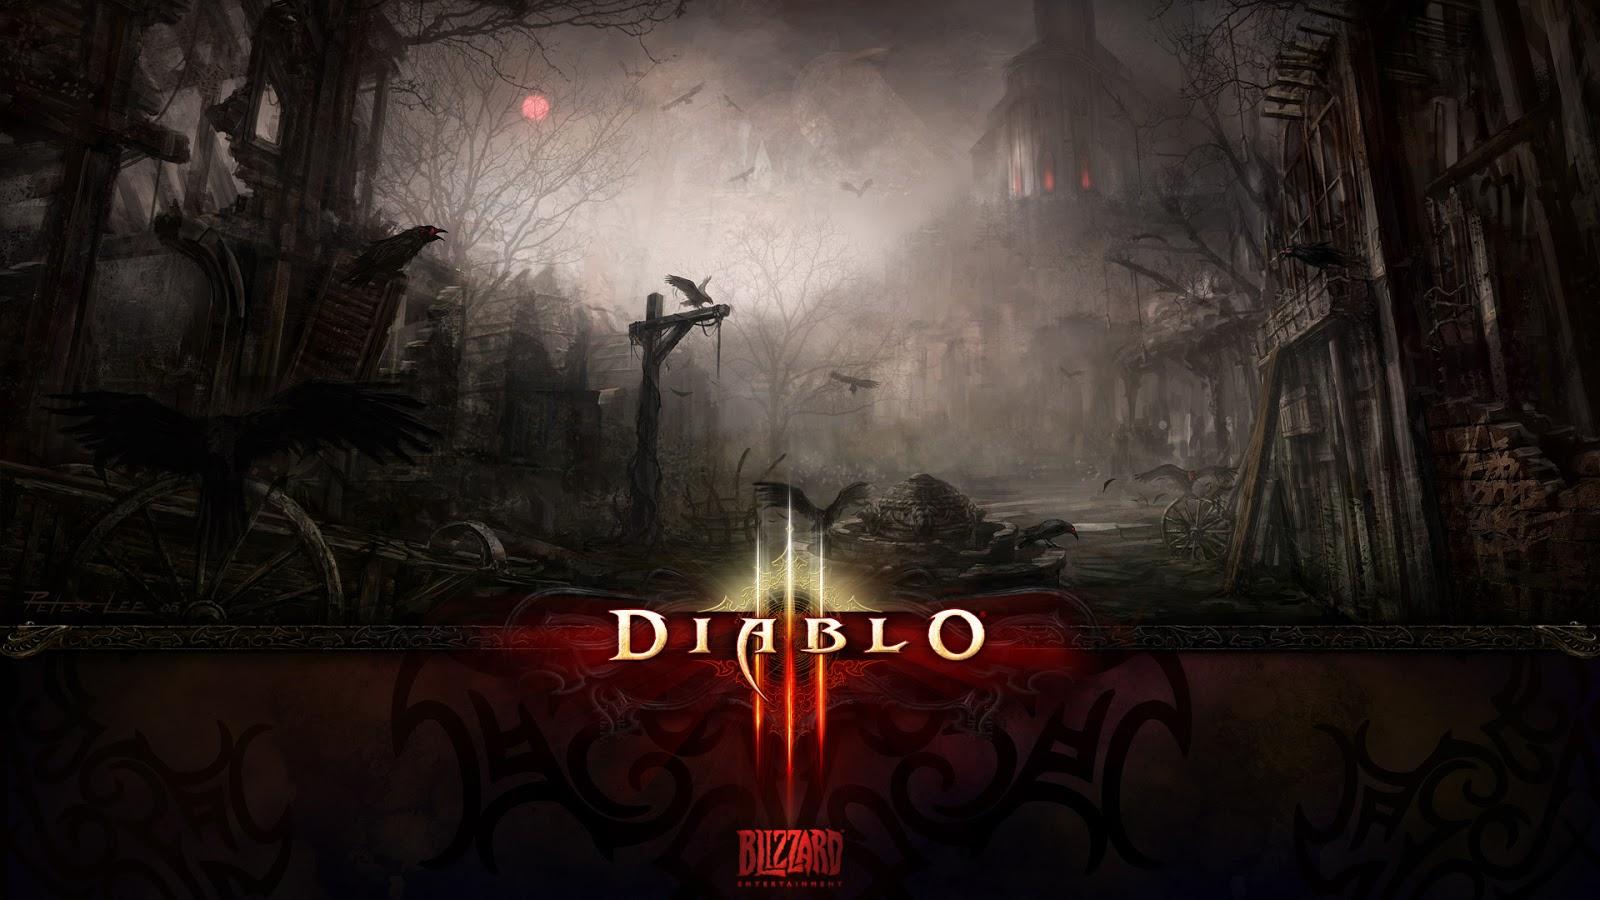 Diablo 3 PS3 Wallpaper